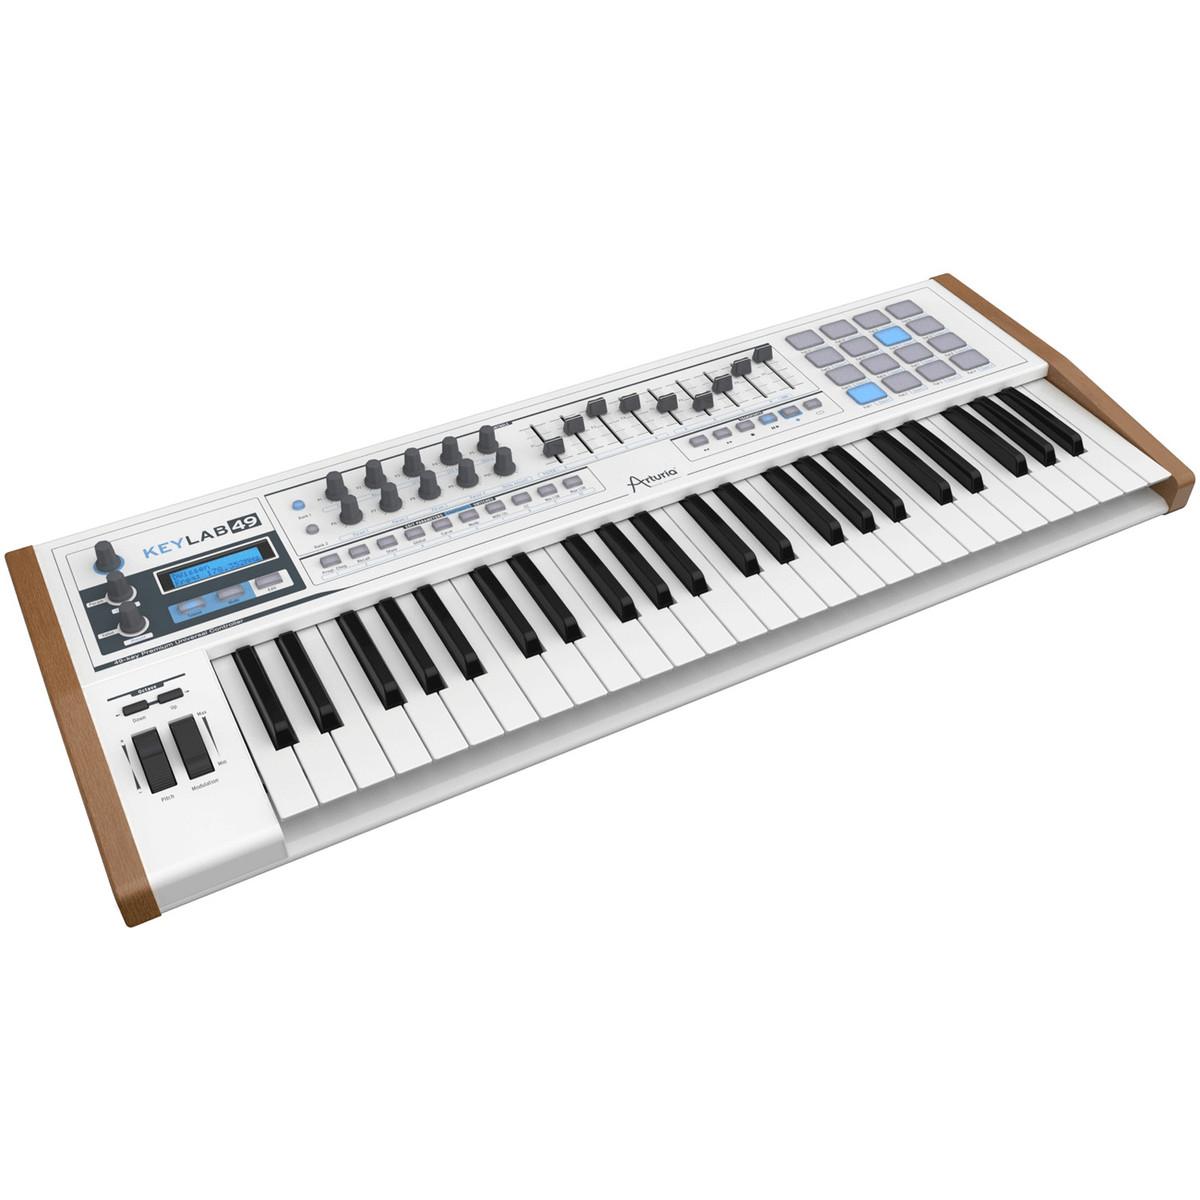 disc arturia keylab 49 midi controller keyboard at. Black Bedroom Furniture Sets. Home Design Ideas